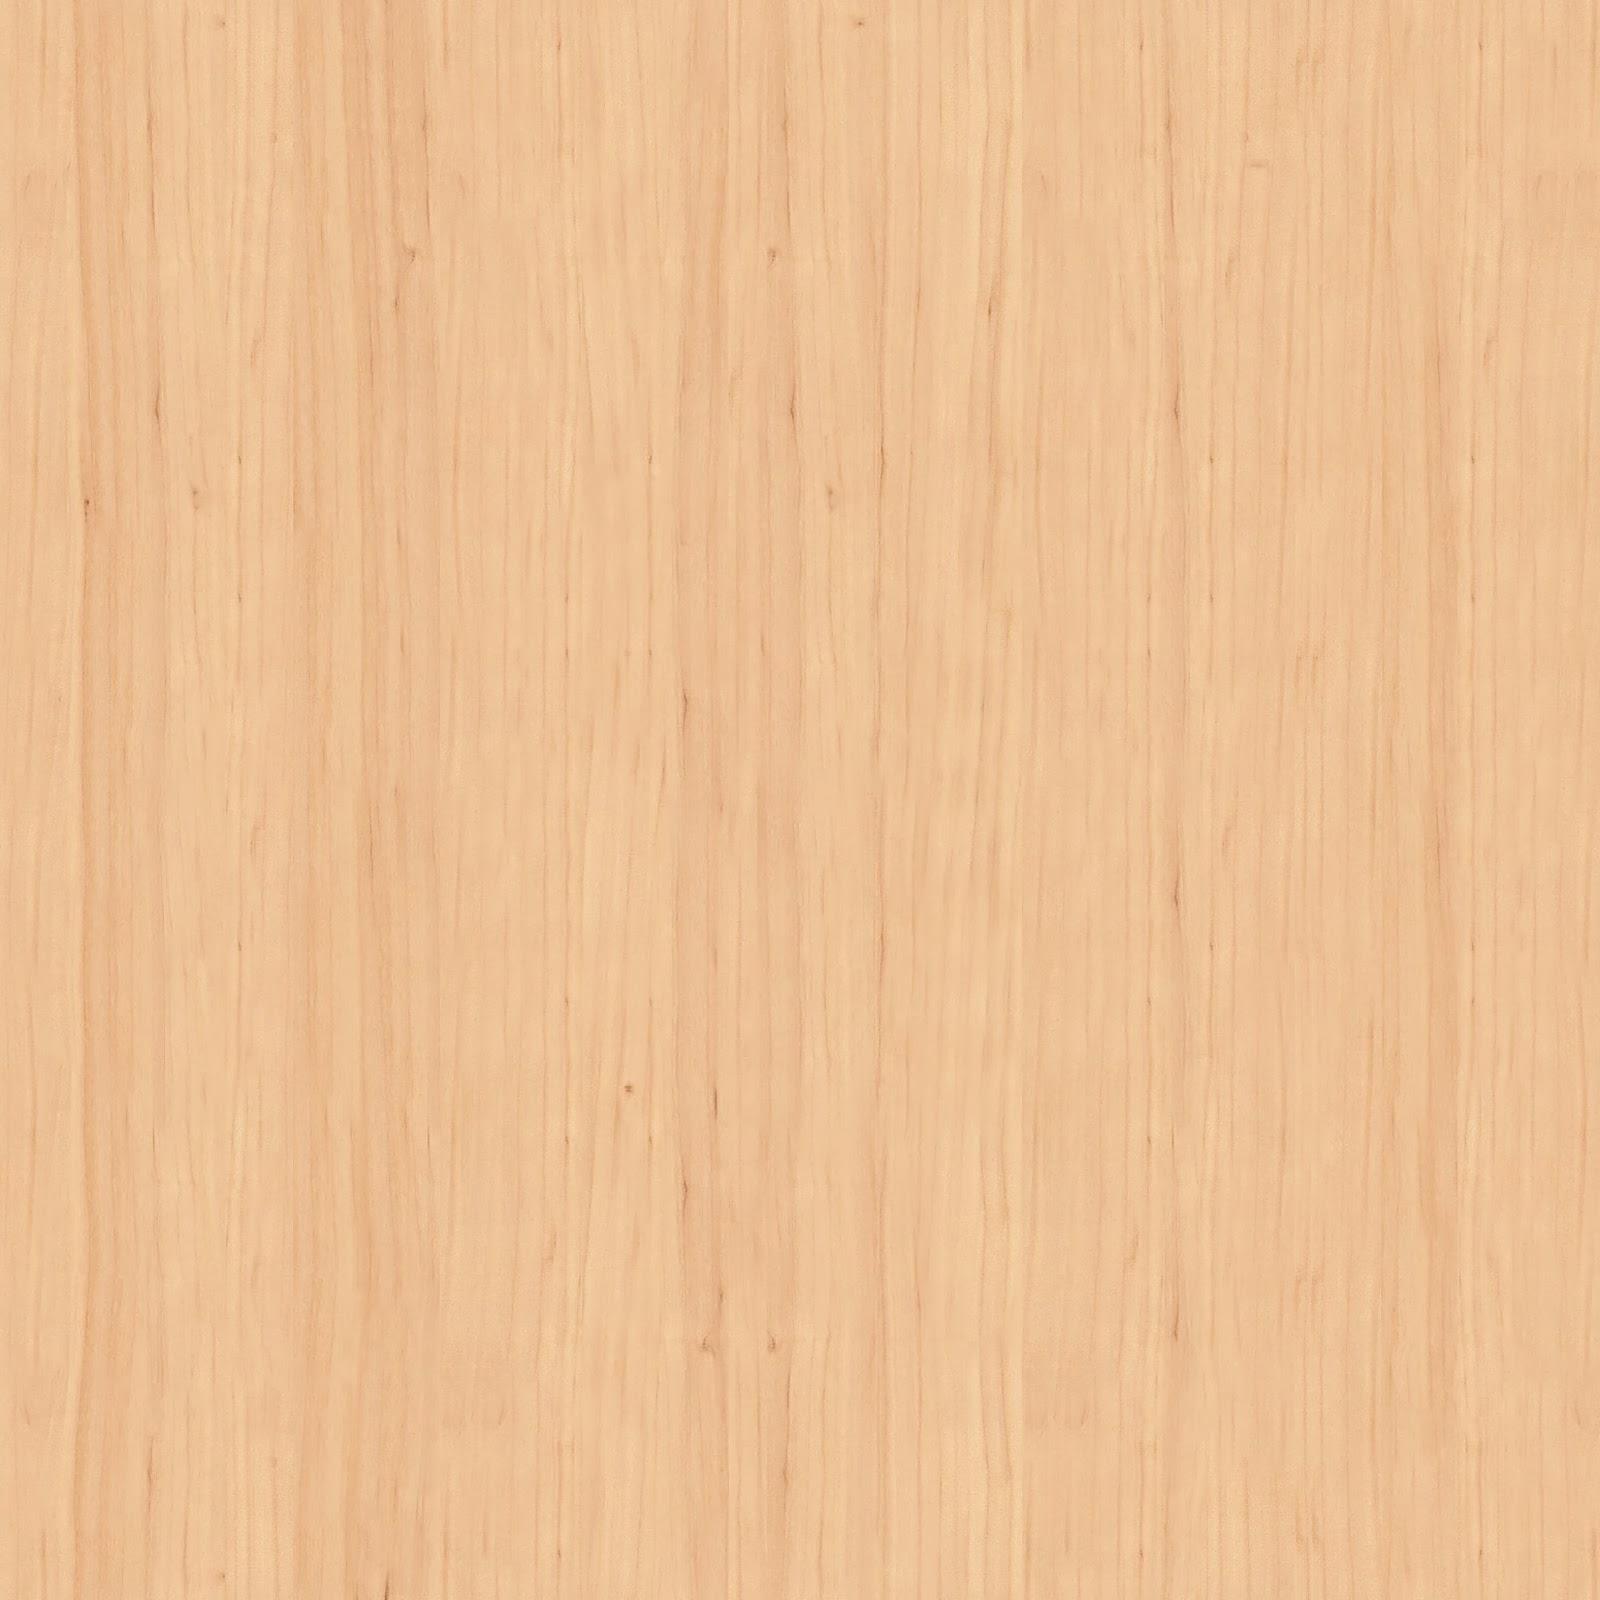 simo texture seamless legno